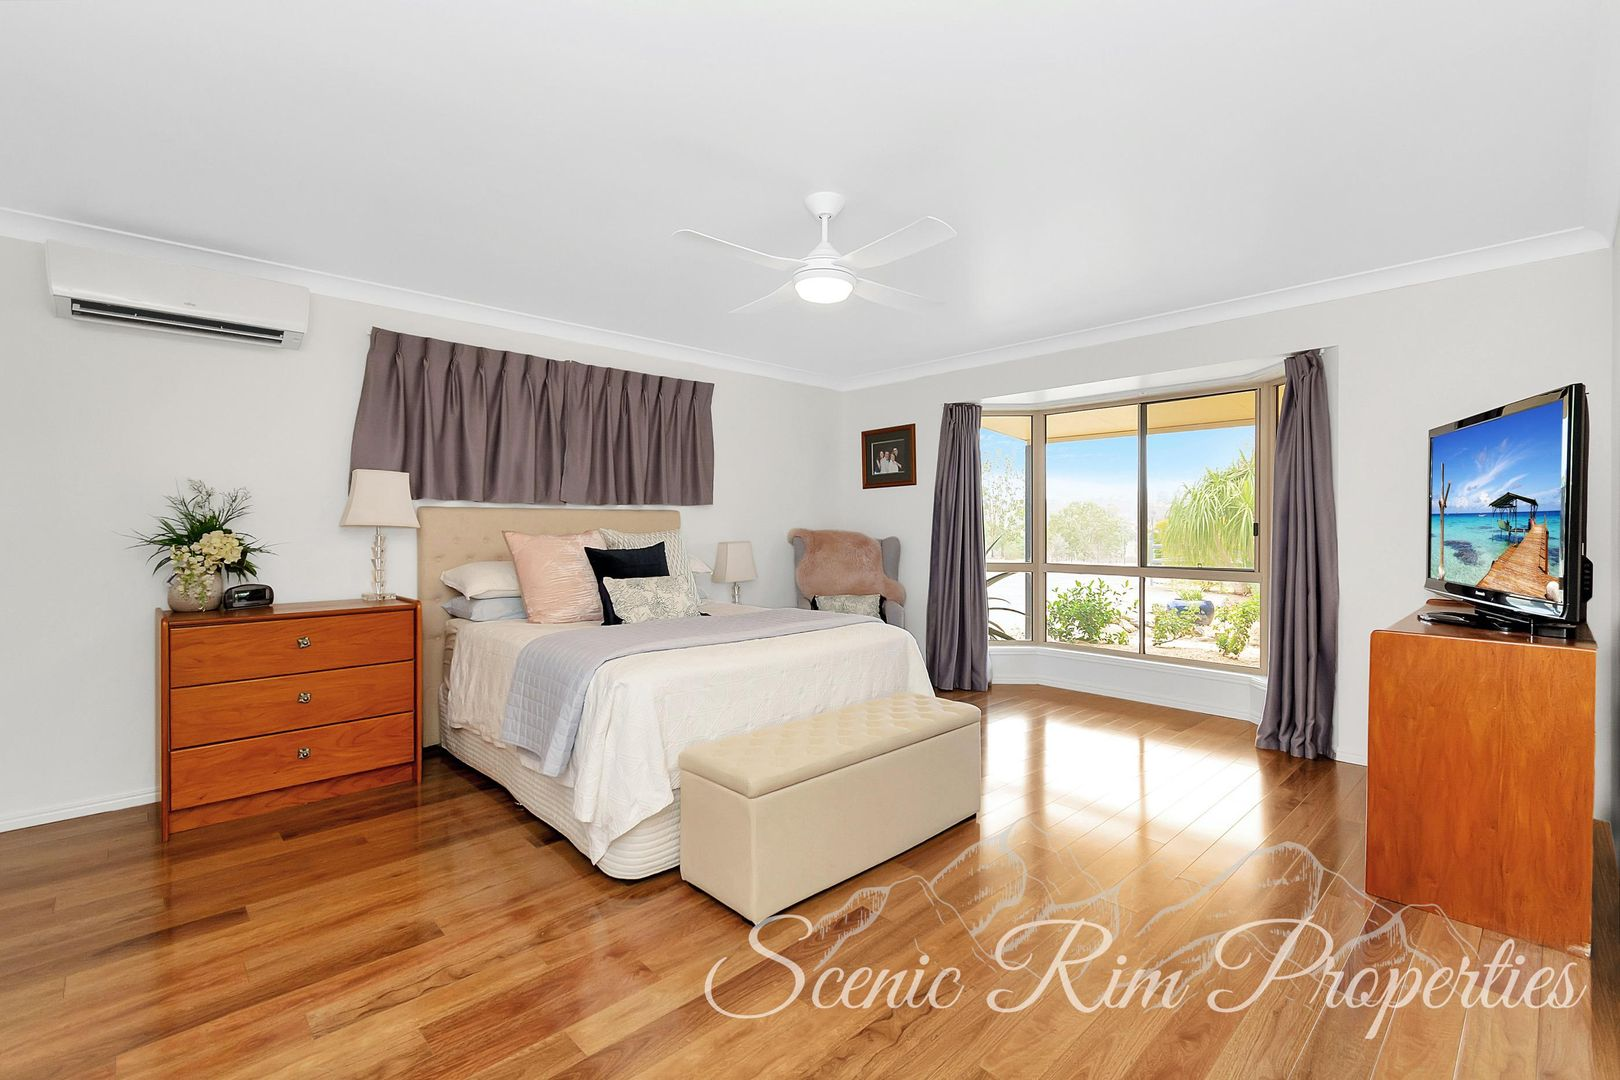 521 Munbilla Road, Munbilla QLD 4309, Image 1